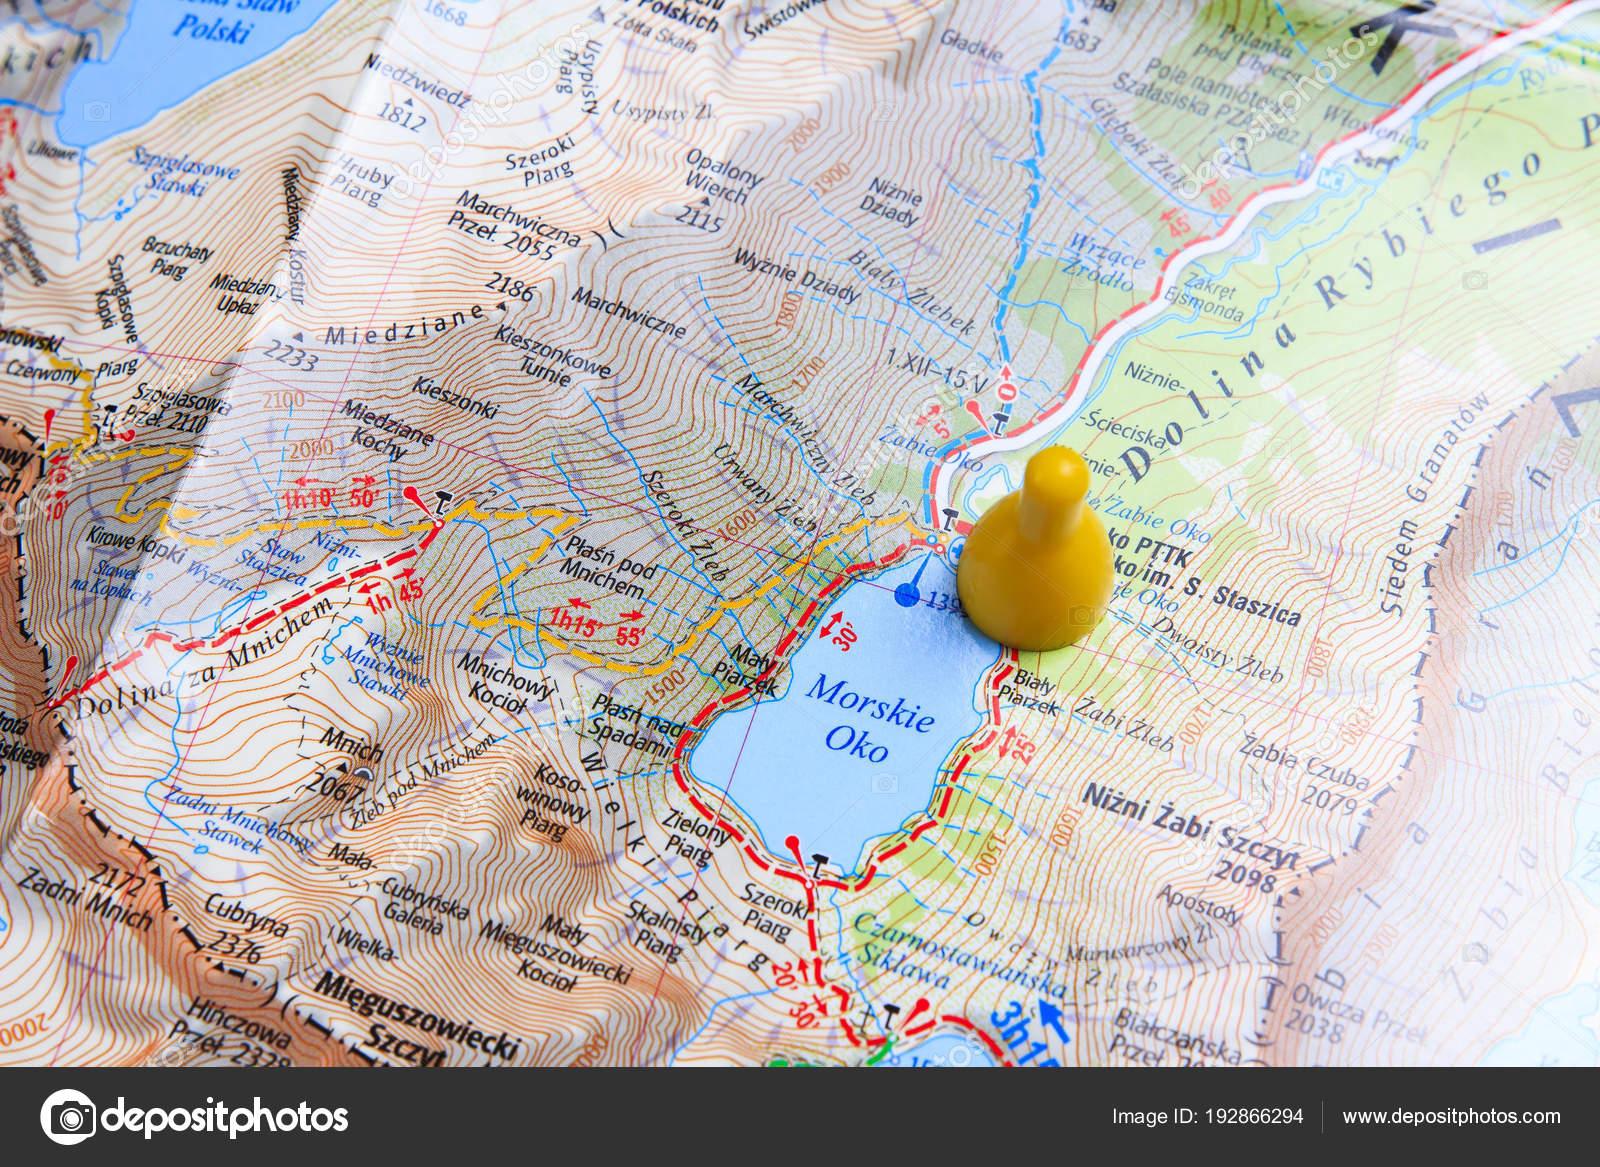 Map Of Zakopane Close Up Walking Route Through The Mountains